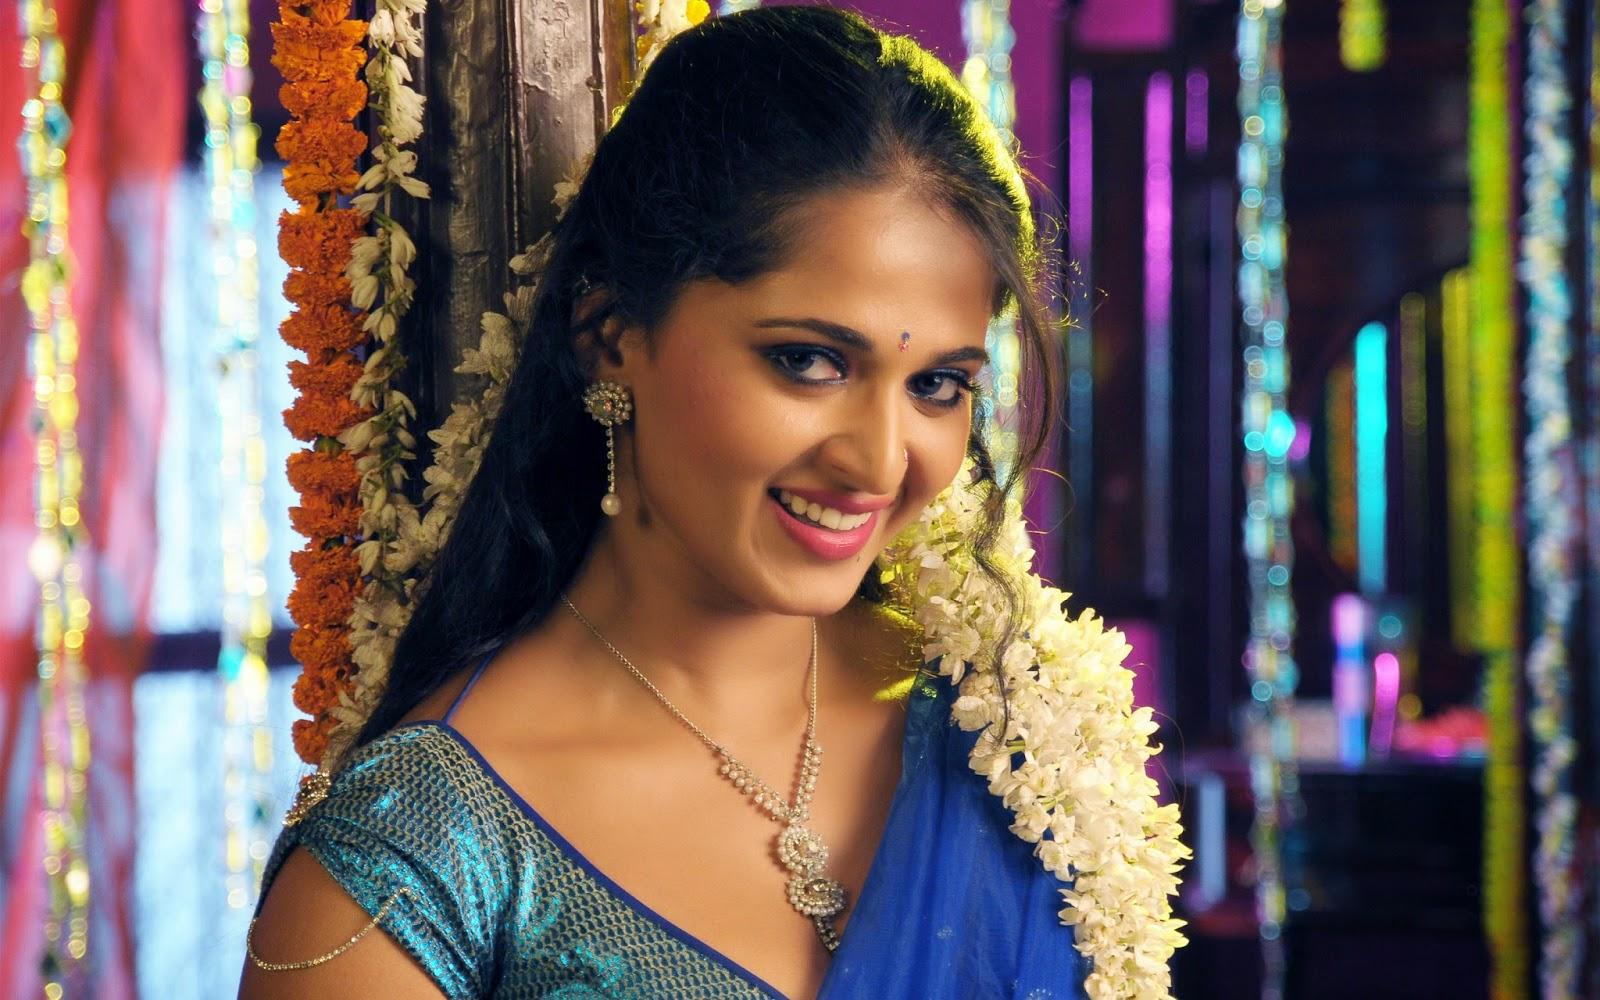 Anushka Cute smile Hot Sexy Scene Images in saree wallpaper